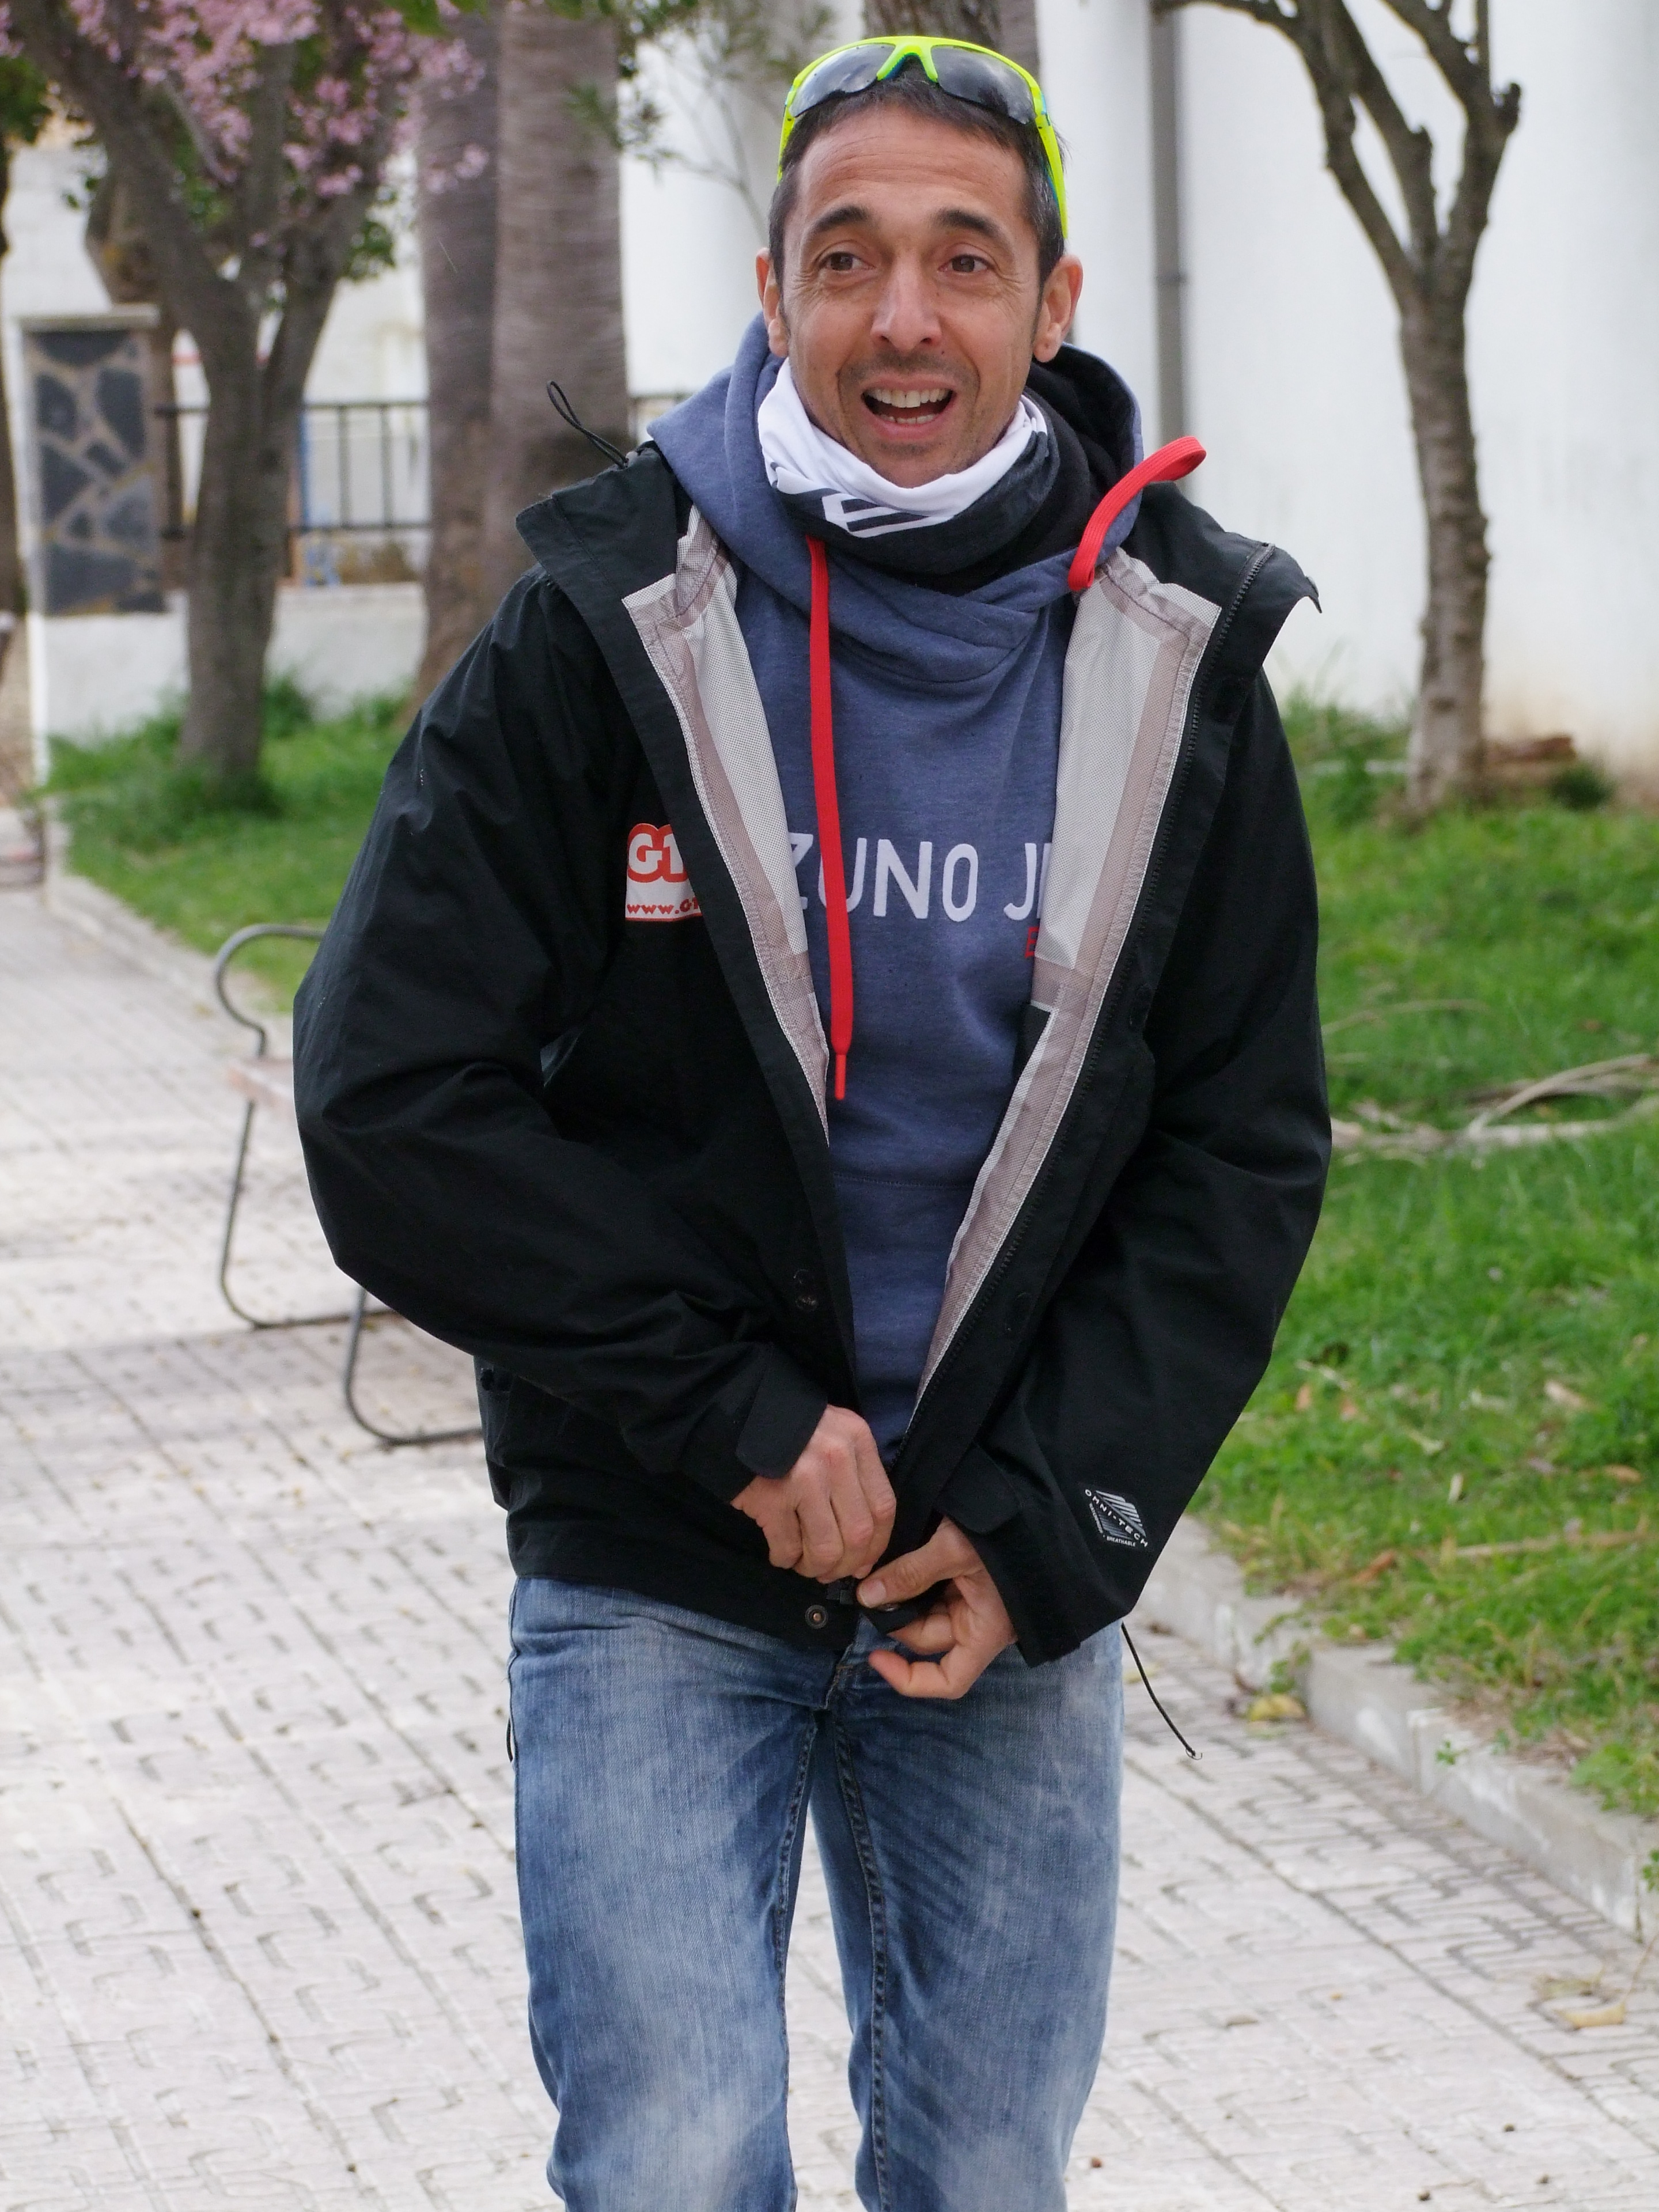 Pedro Jóse Hernandez-TTN